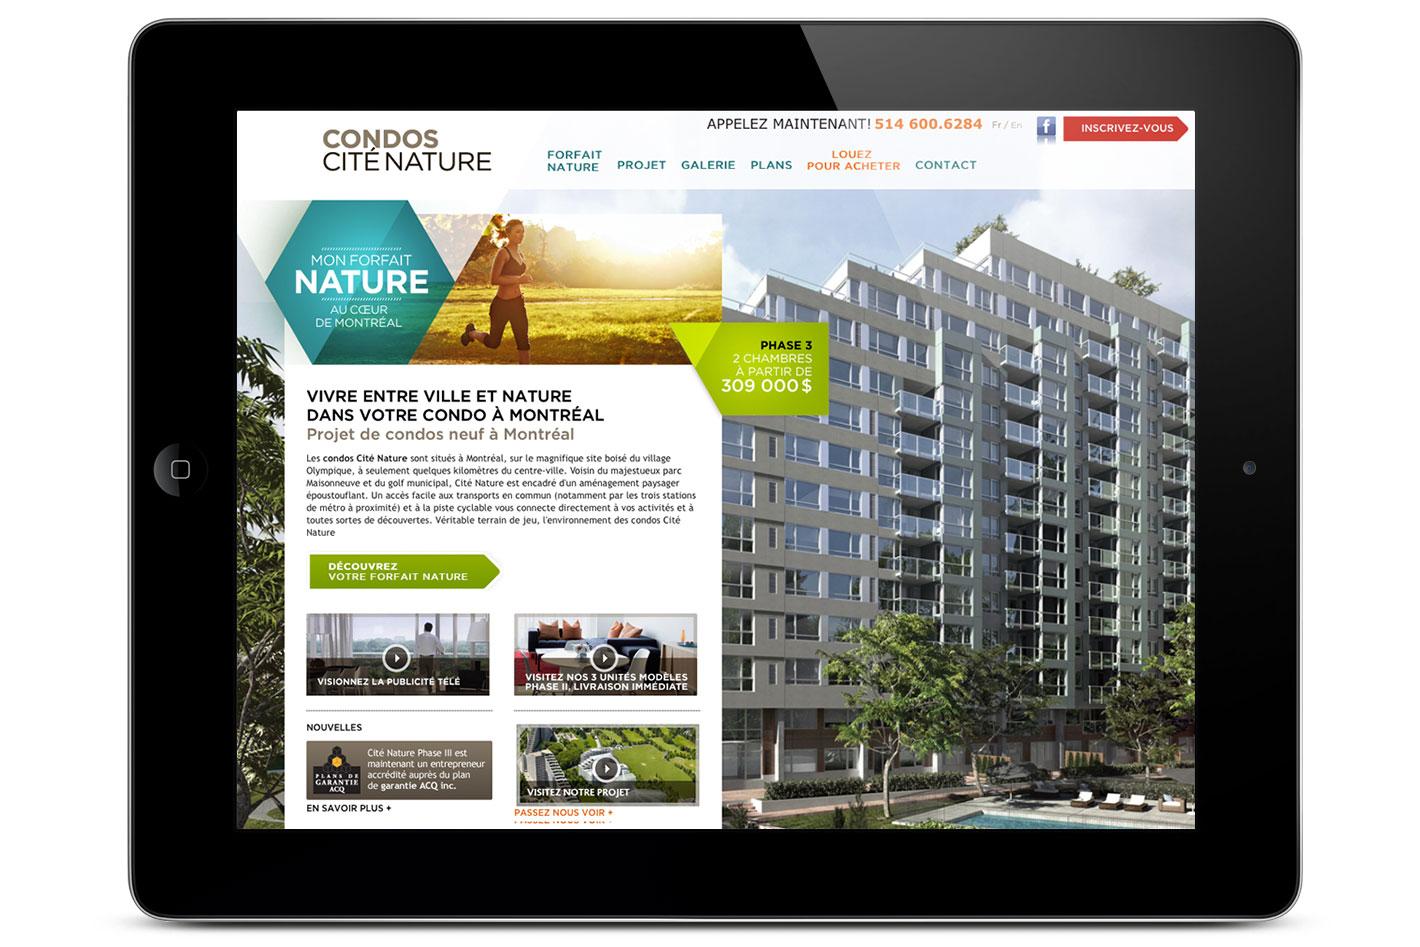 CN_Campagnes_IMGS_1420x947-iPad-horizontal